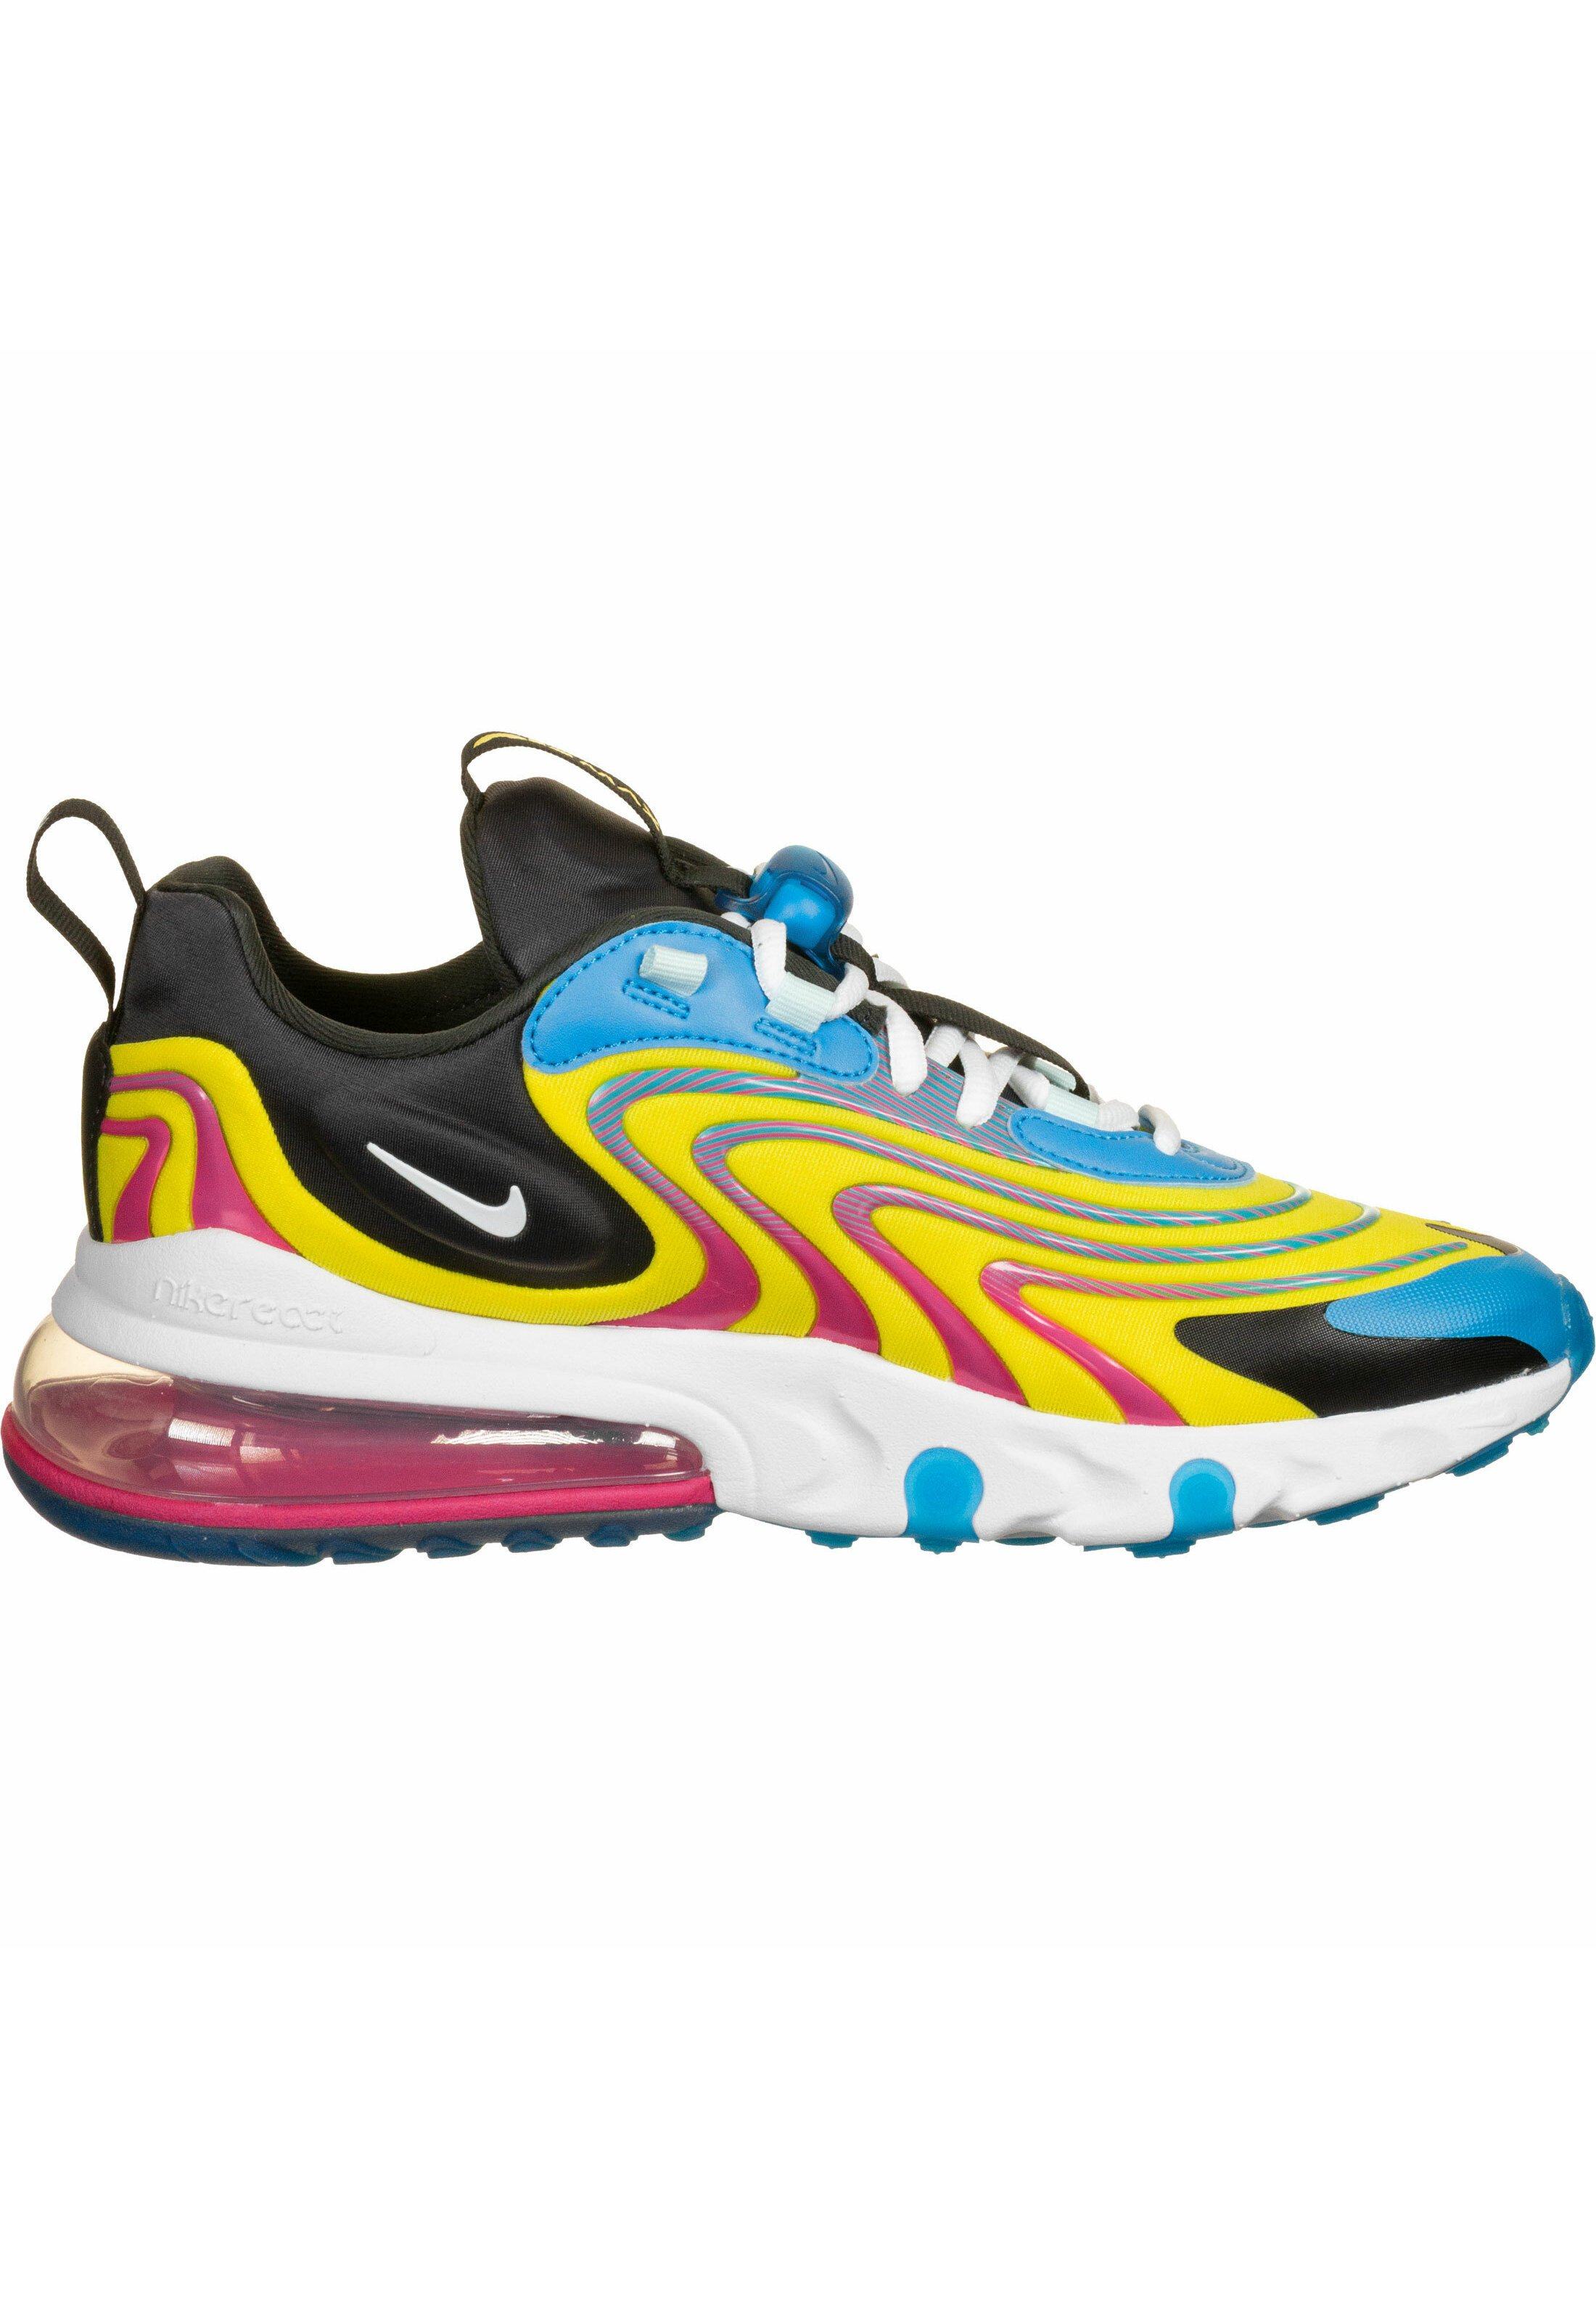 Nike Sportswear SCHUHE AIR MAX 270 REACT - Sneaker low - laser blue/white/anthracite/mint - Herrenschuhe cymGq